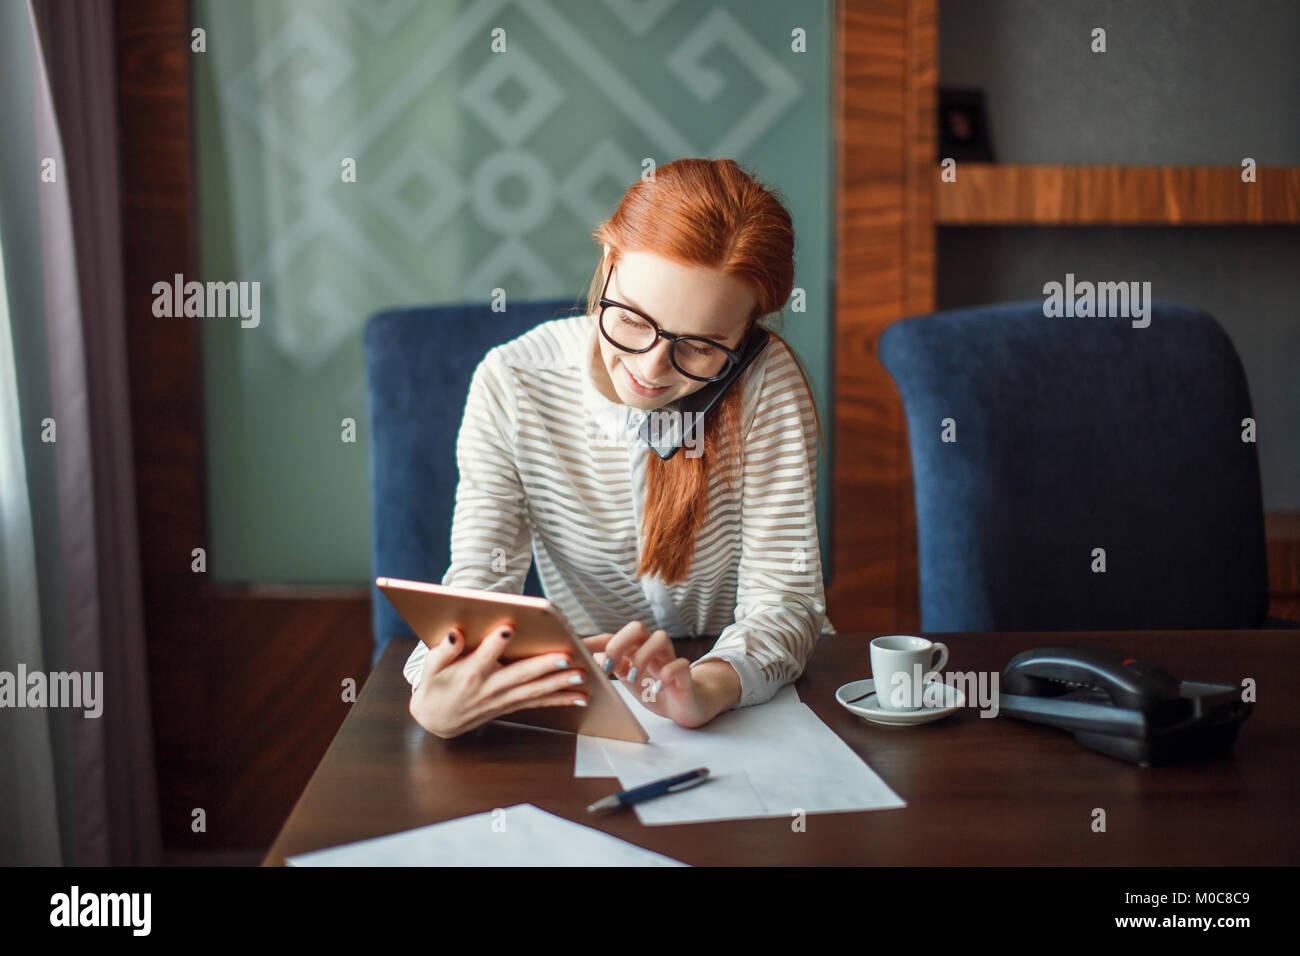 La empresaria trabaja en Office Imagen De Stock